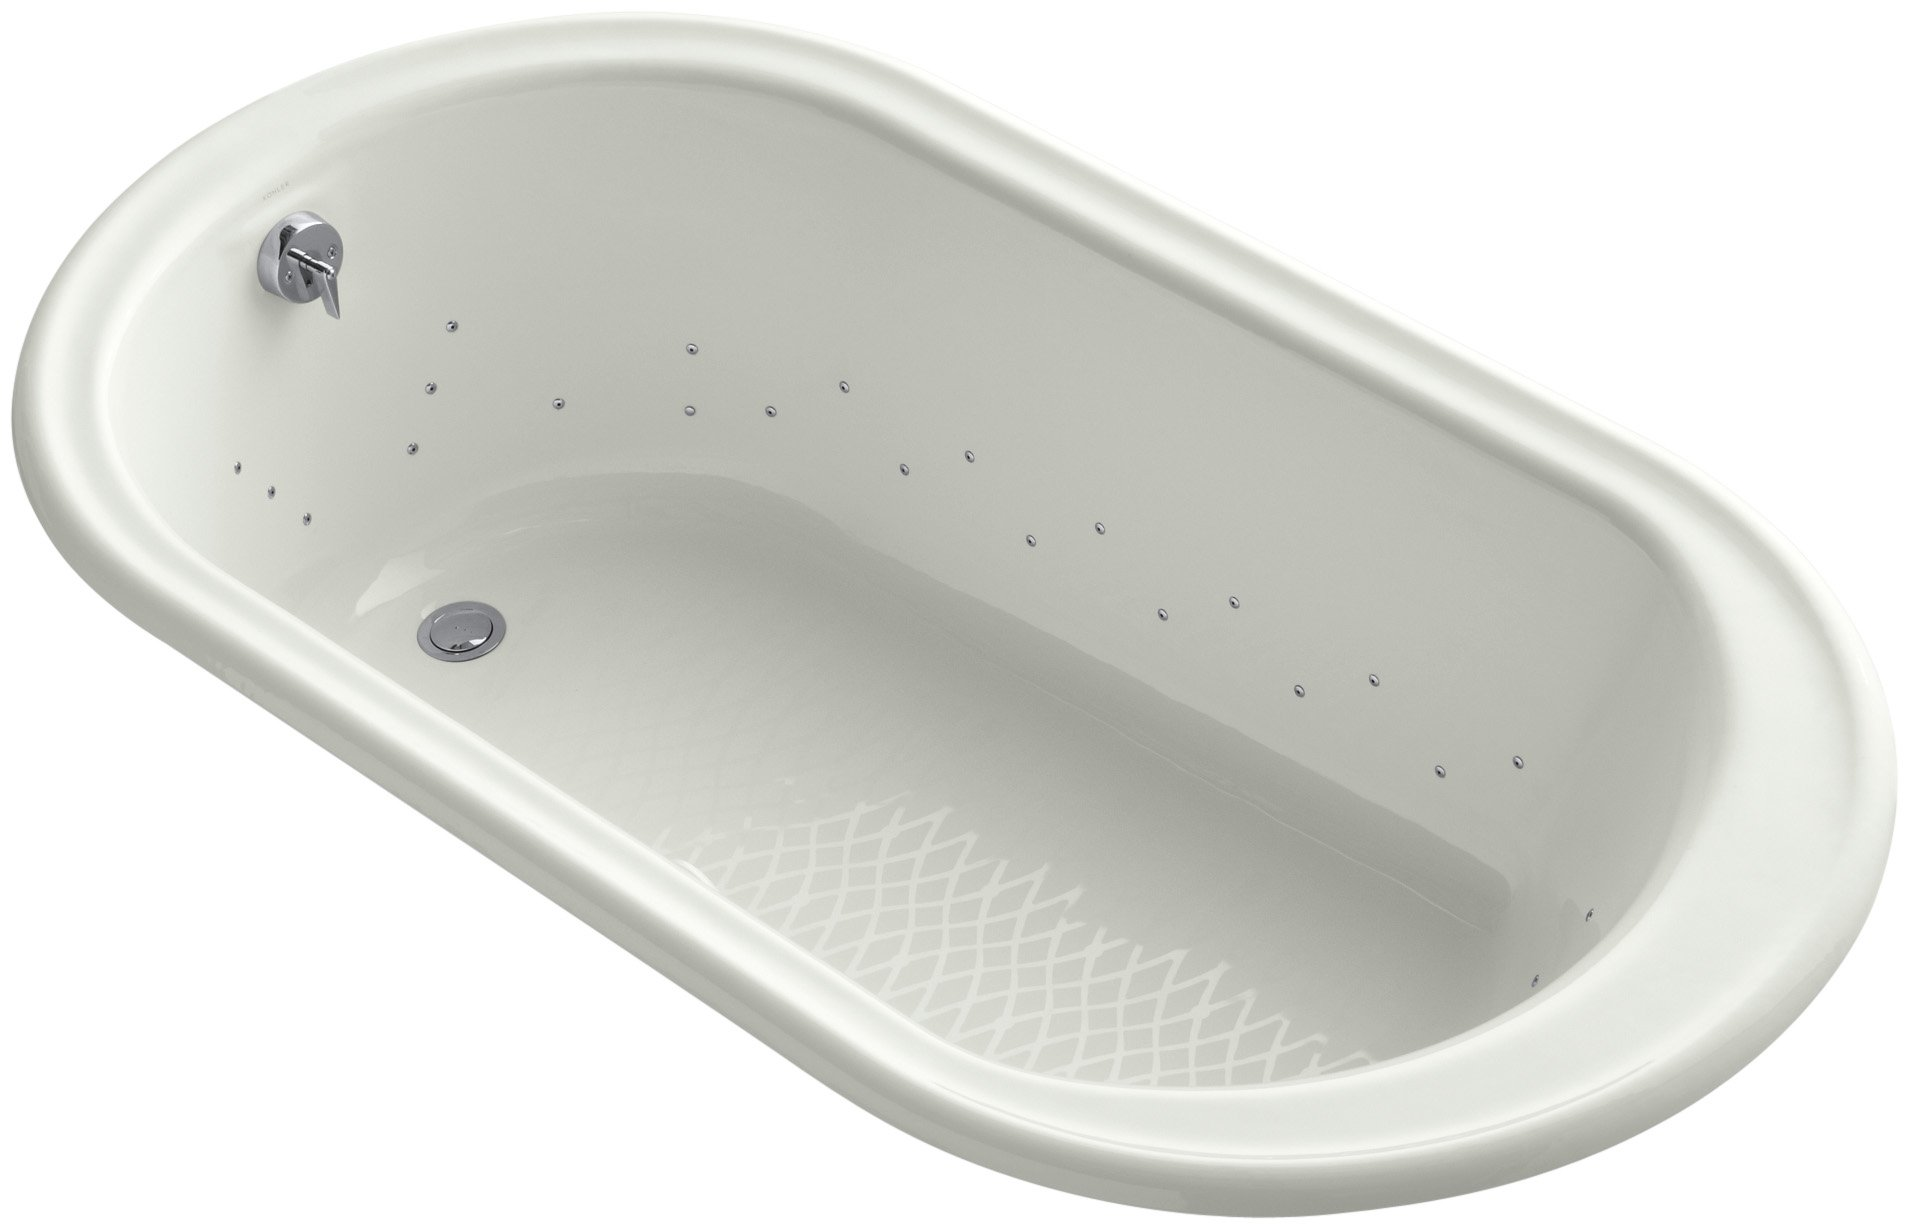 Kohler K-712-GCP-NY Iron Works Bubblemassage 5.5Ft Bath with Polished Chrome Airjet Color, Dune